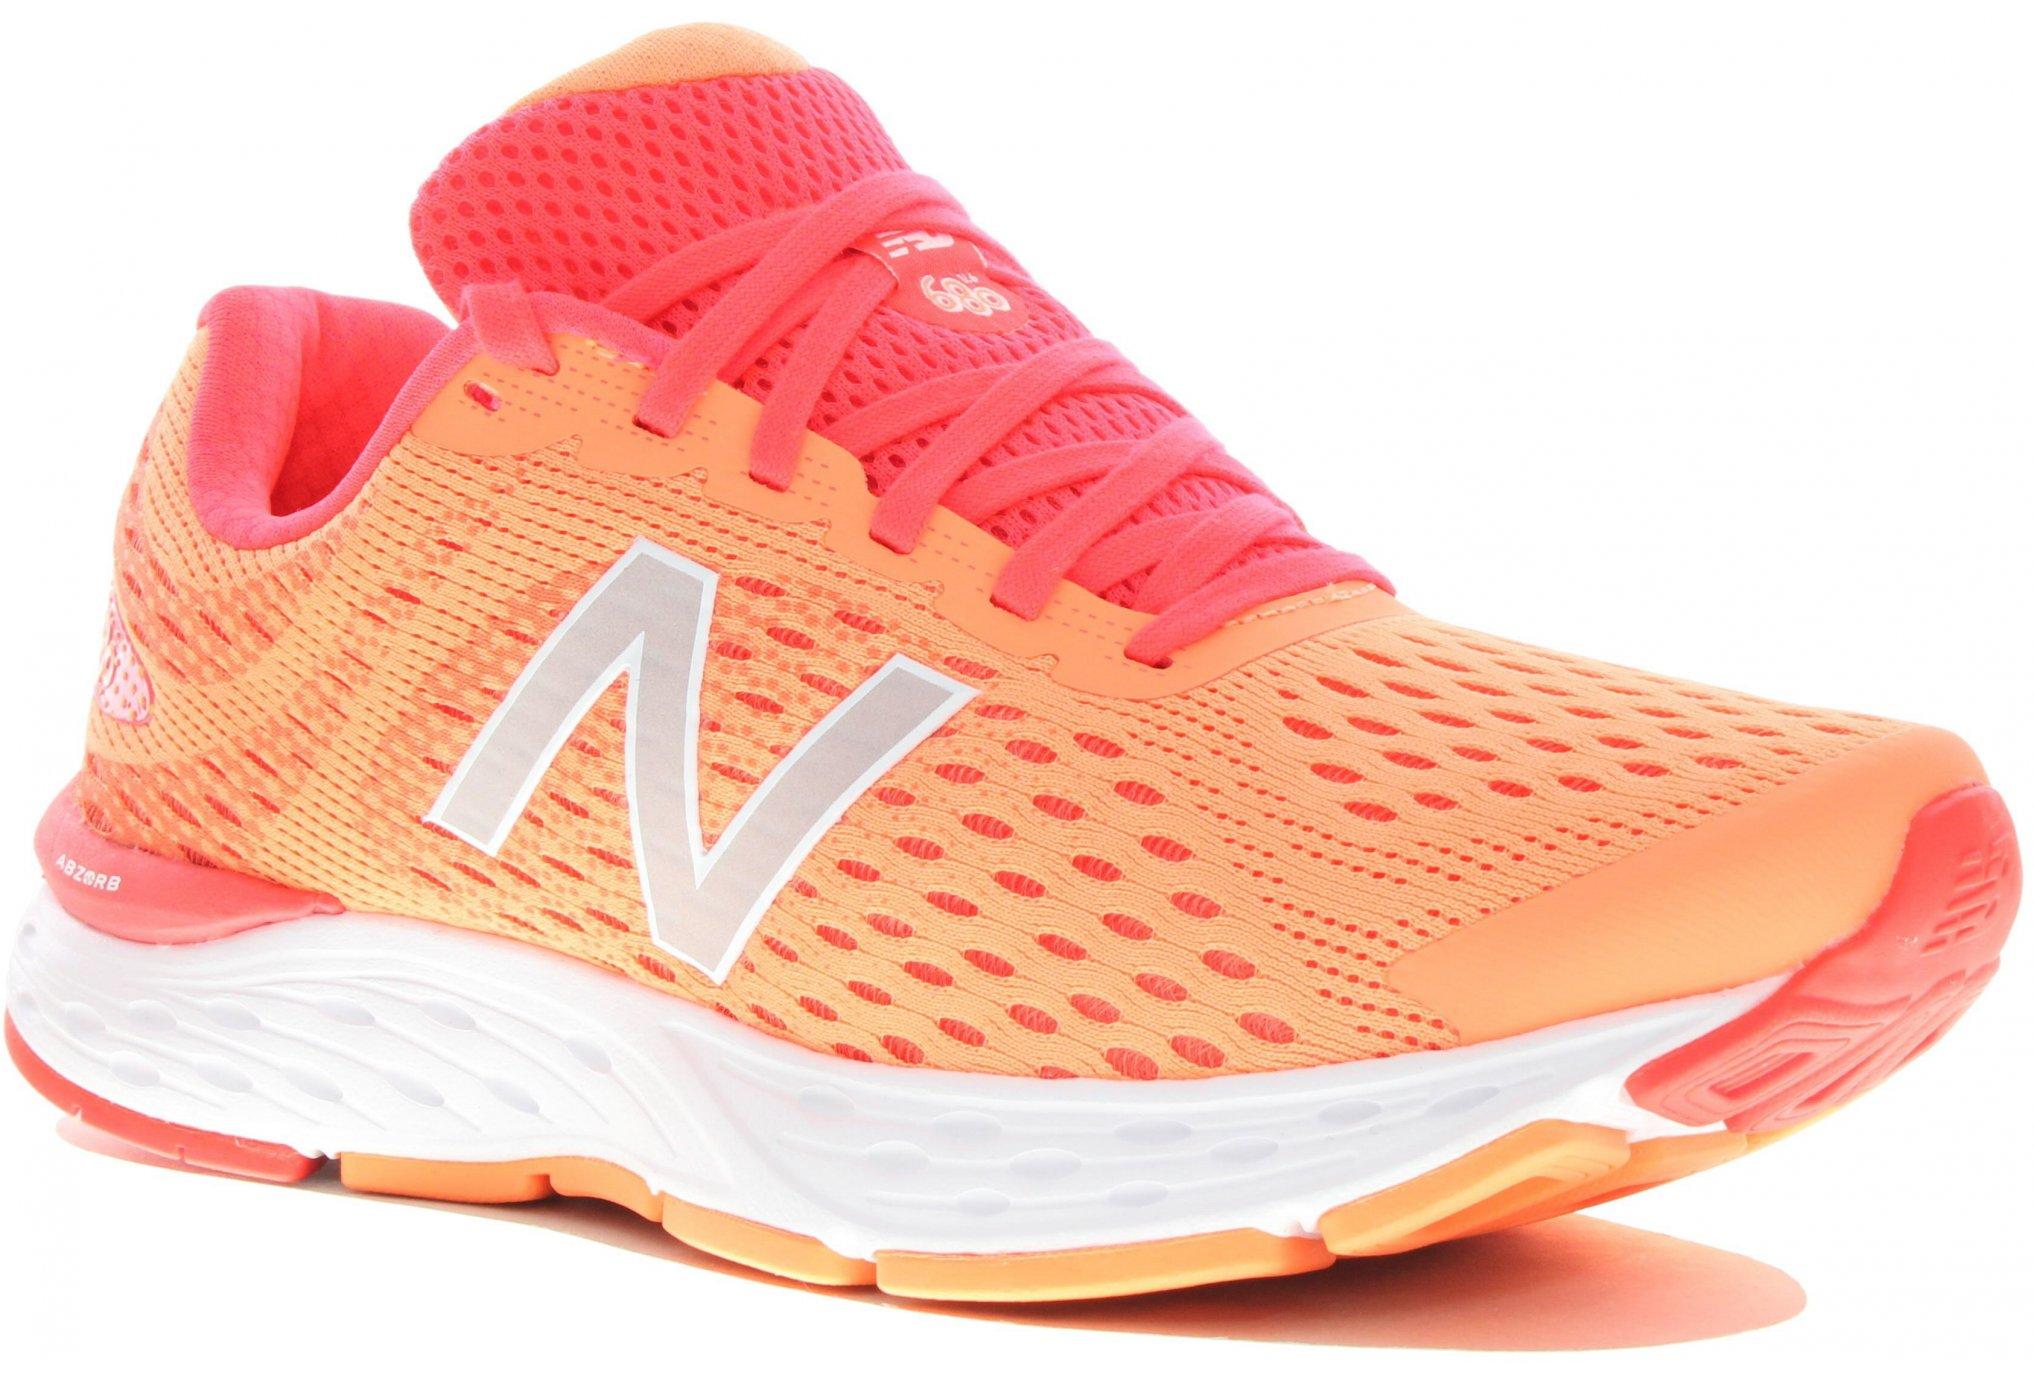 New Balance W 680 V6 - B Chaussures running femme